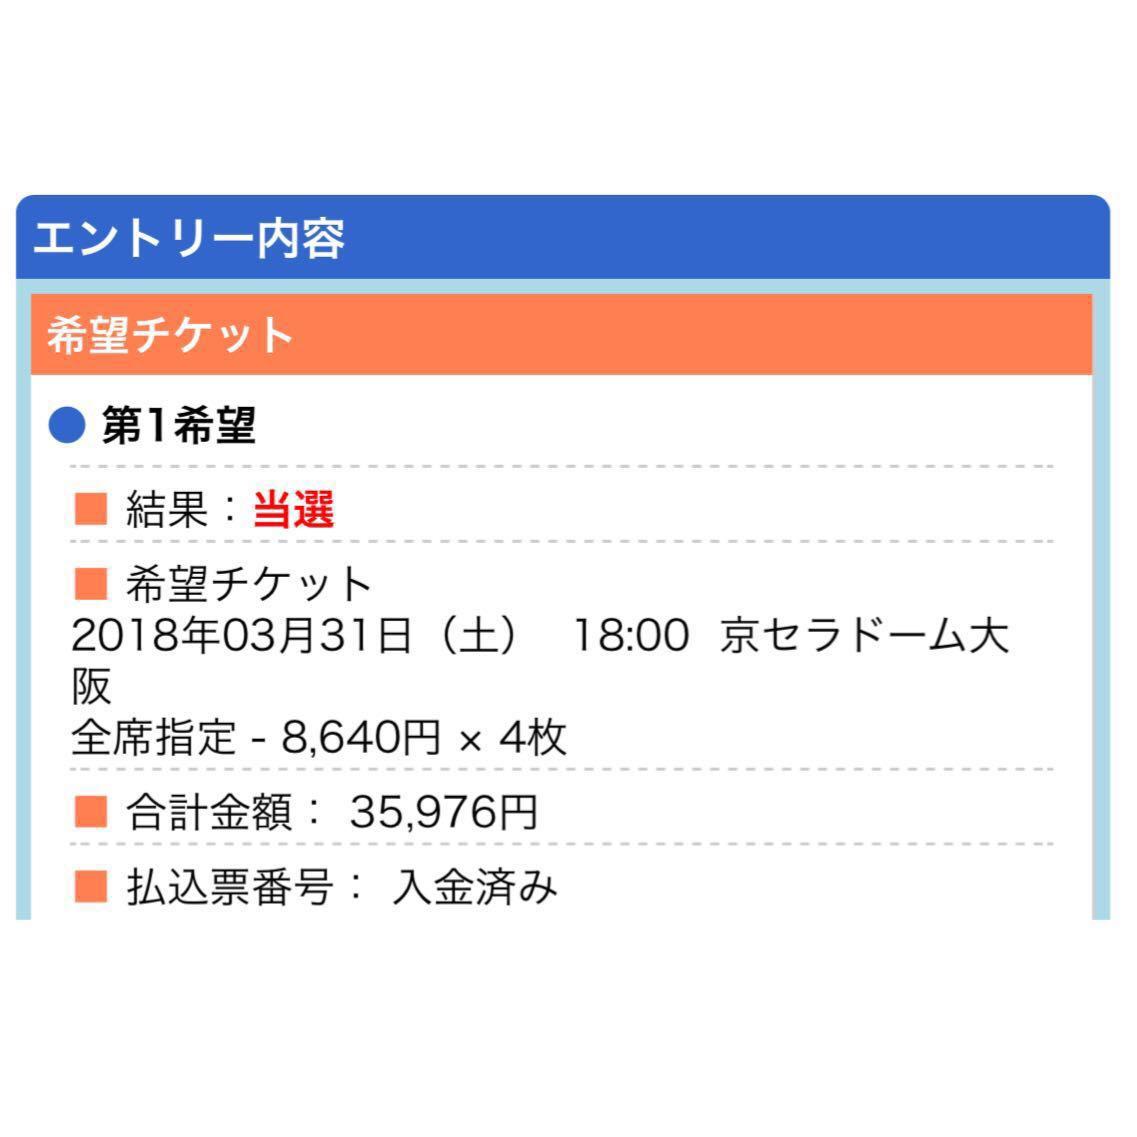 【PM先行 良席期待 1枚2万即決】ONE OK ROCK ワンオク 3/31(土) 京セラドーム 大阪 連番1-3枚 女性名義 AMBITIONS JAPAN DOME TOUR_画像2